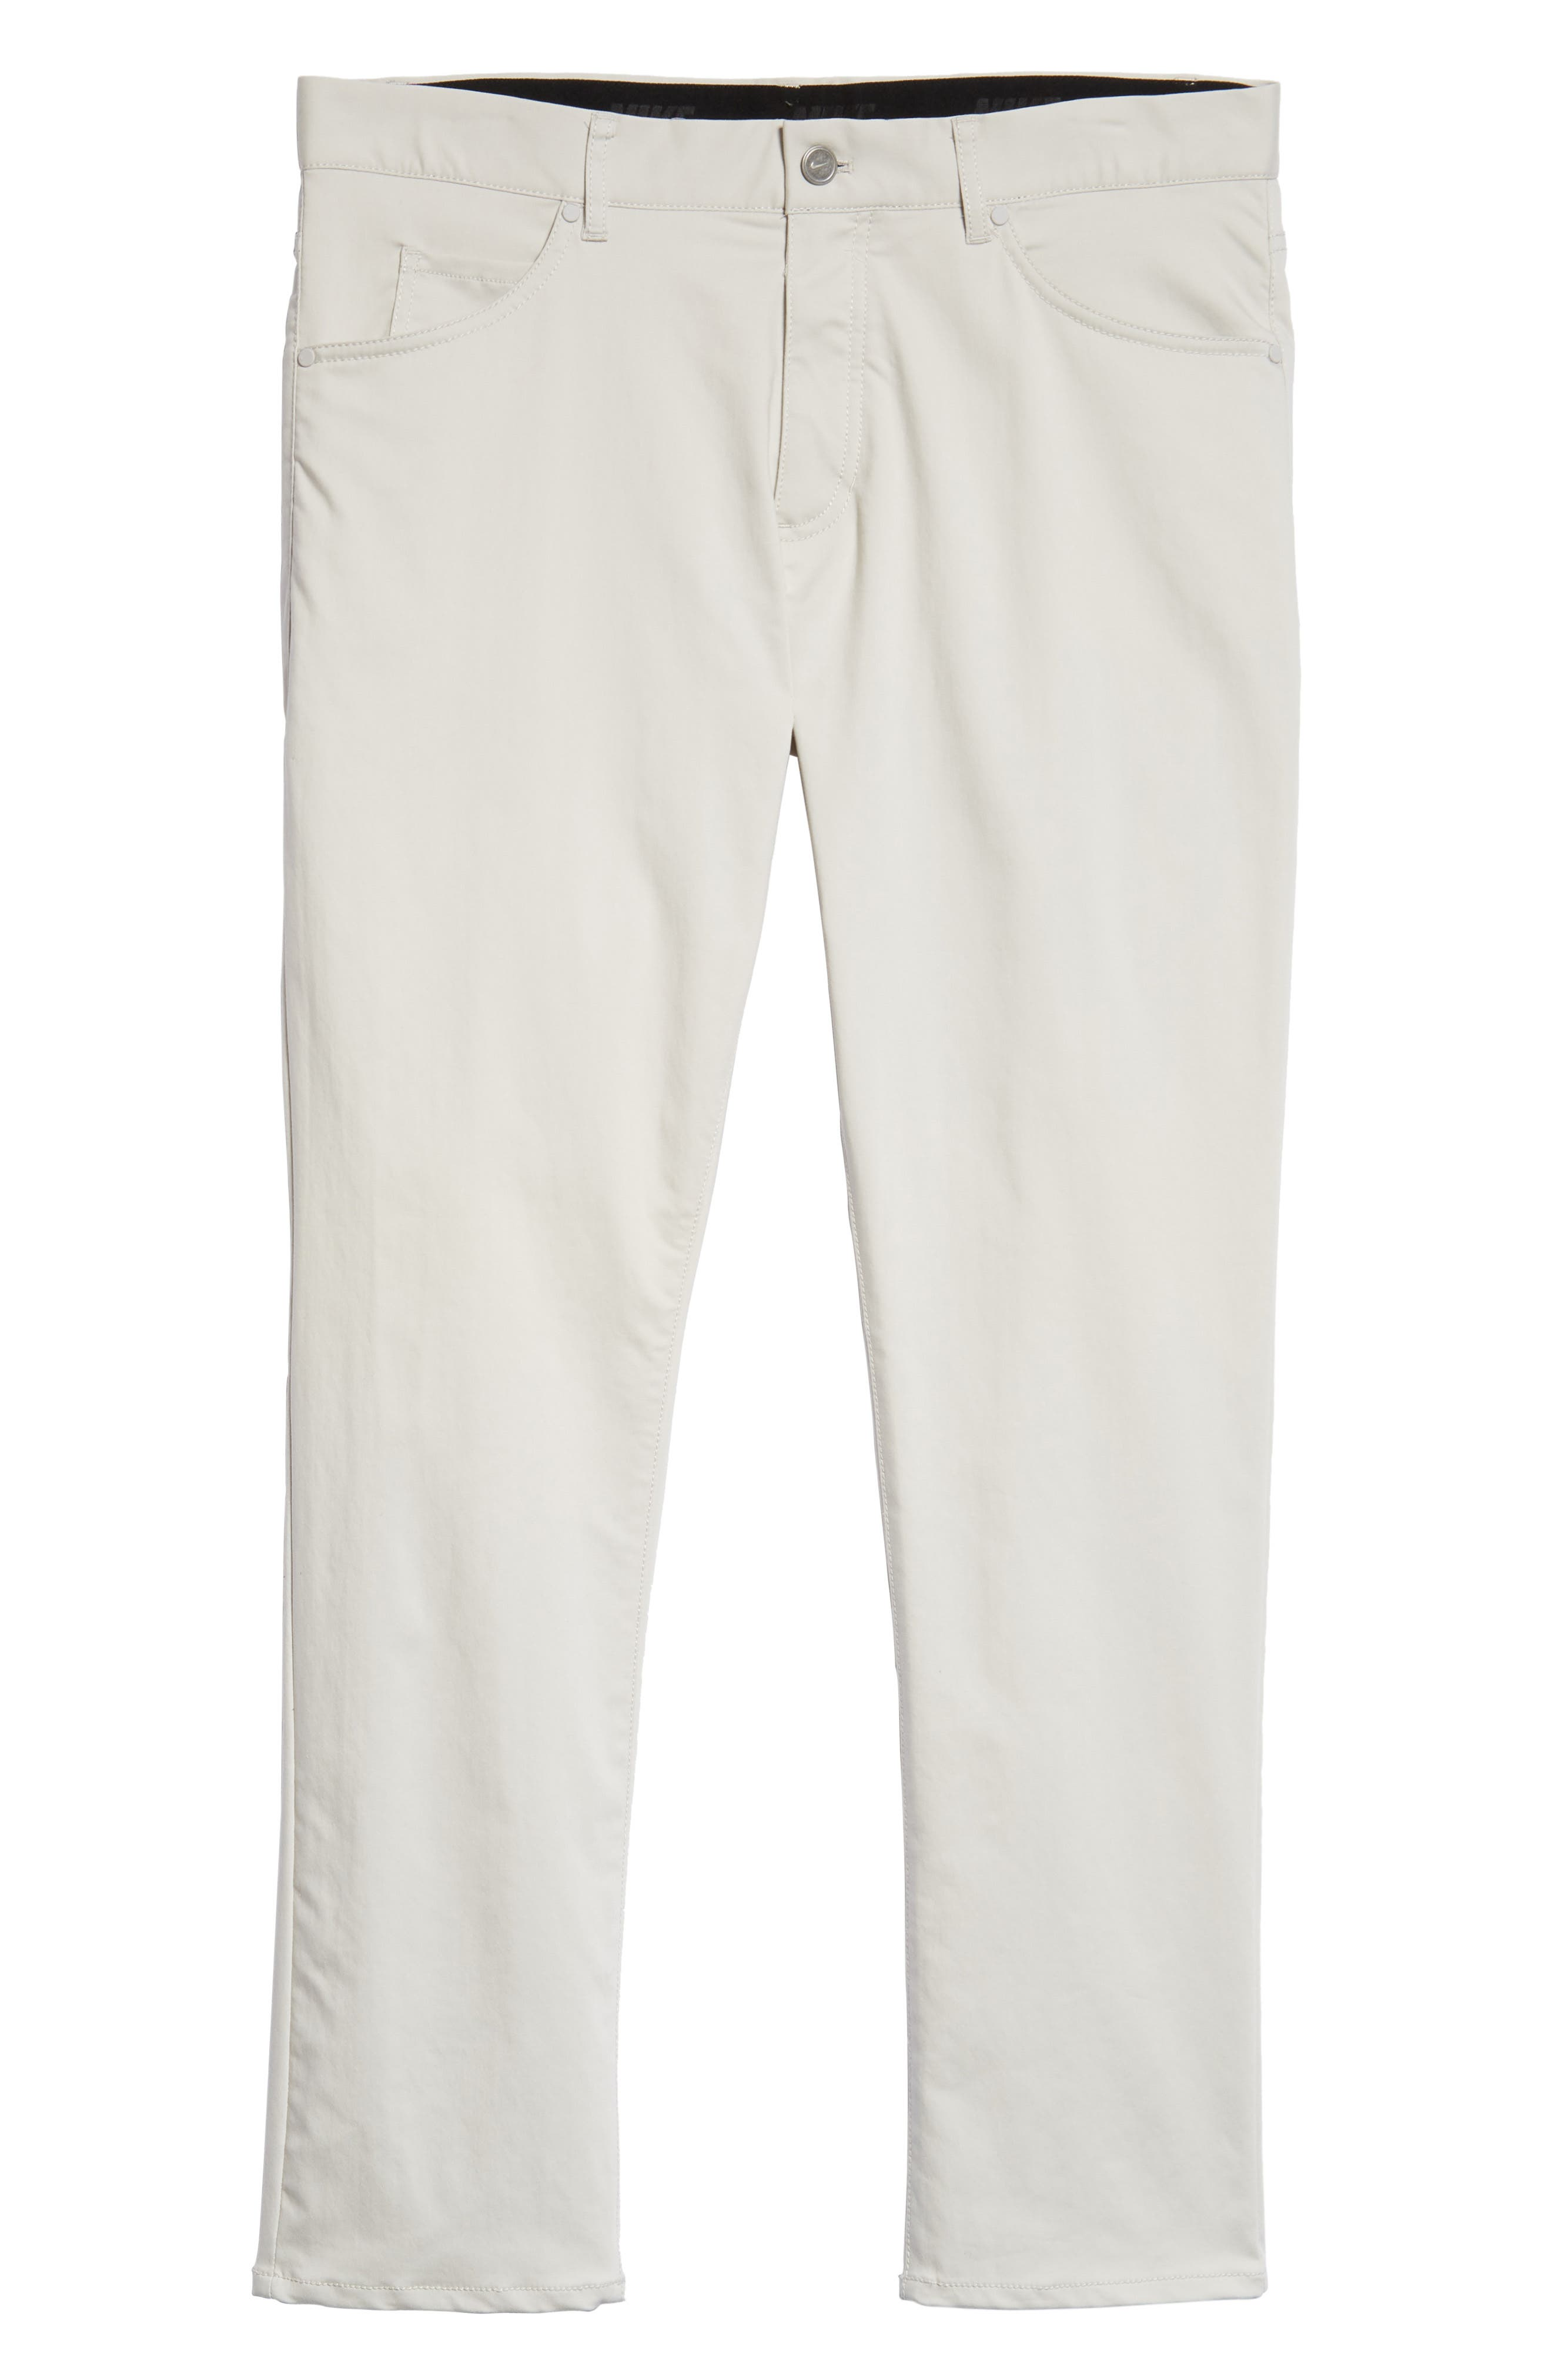 Dry Flex Slim Fit Golf Pants,                             Alternate thumbnail 6, color,                             LIGHT BONE/ WHITE